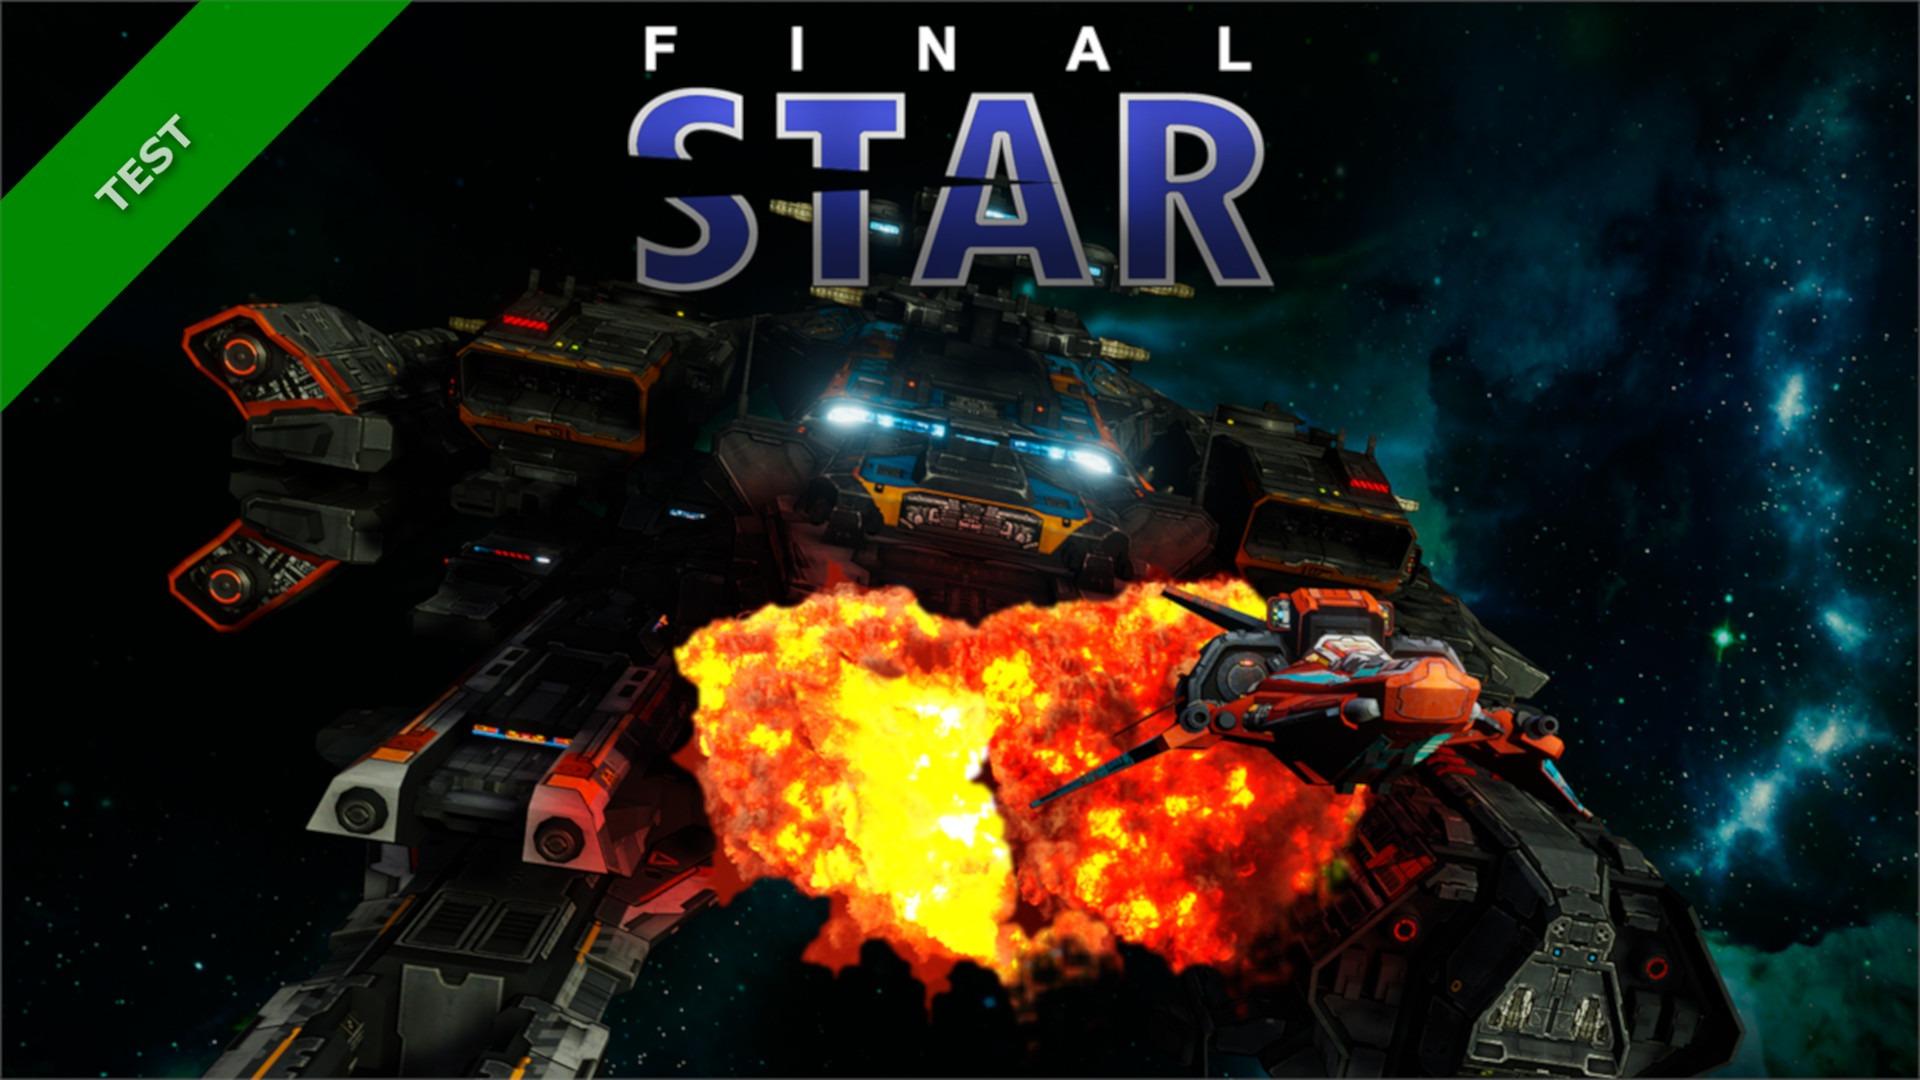 TEST Final Star XWFR